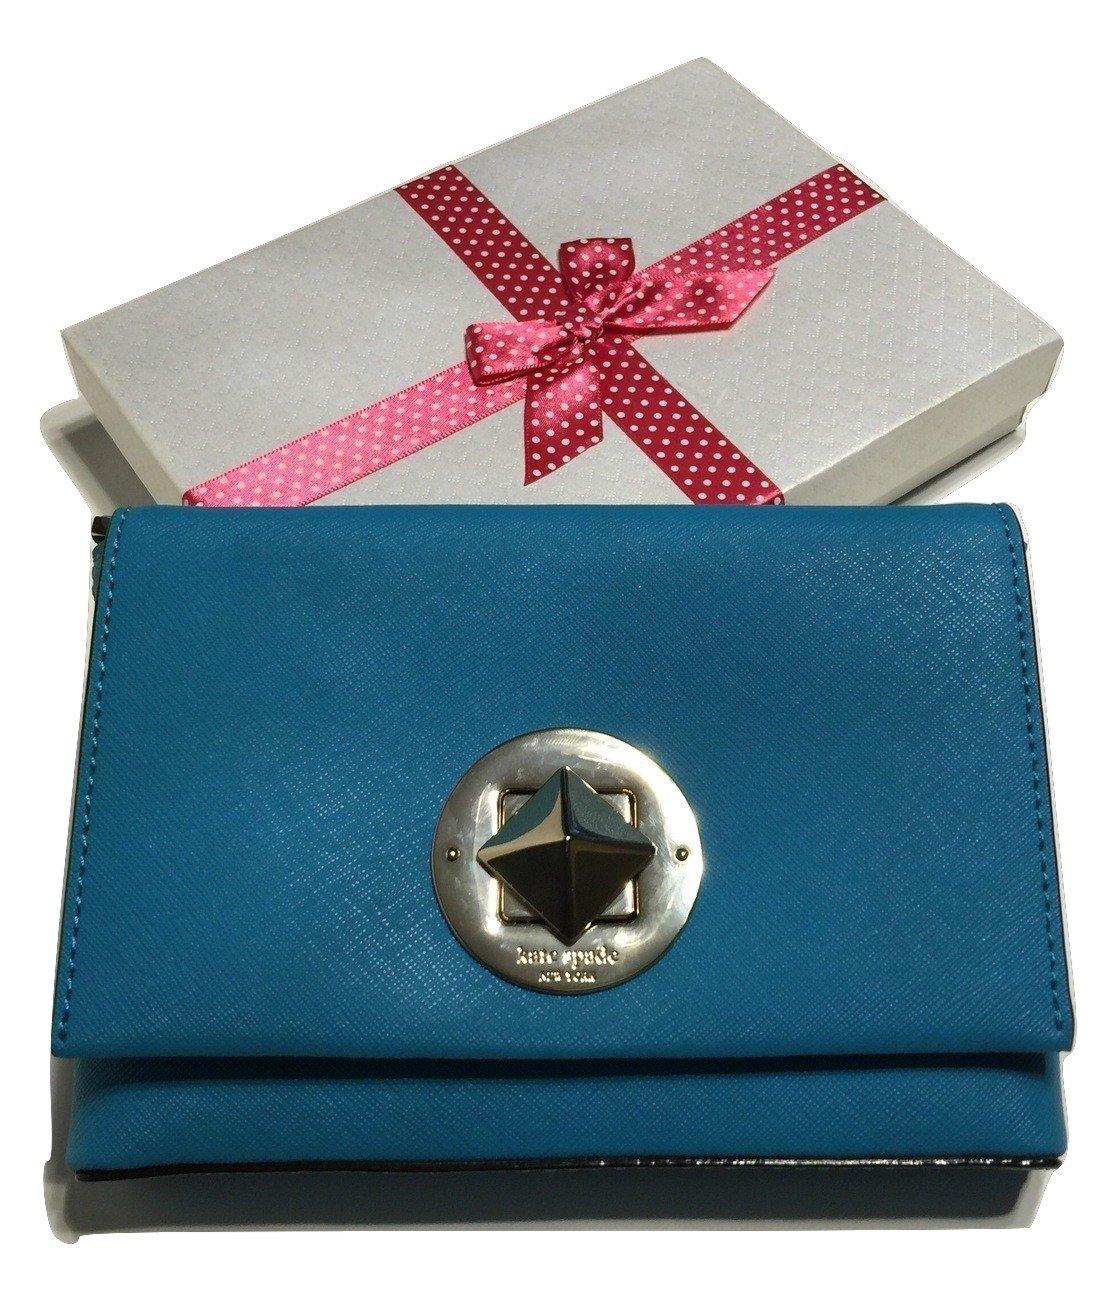 Kate Spade Newbury Lane Sally Crossbody Saffiano Leather WKRU3430 with Gift Box (Neon Turquoise)